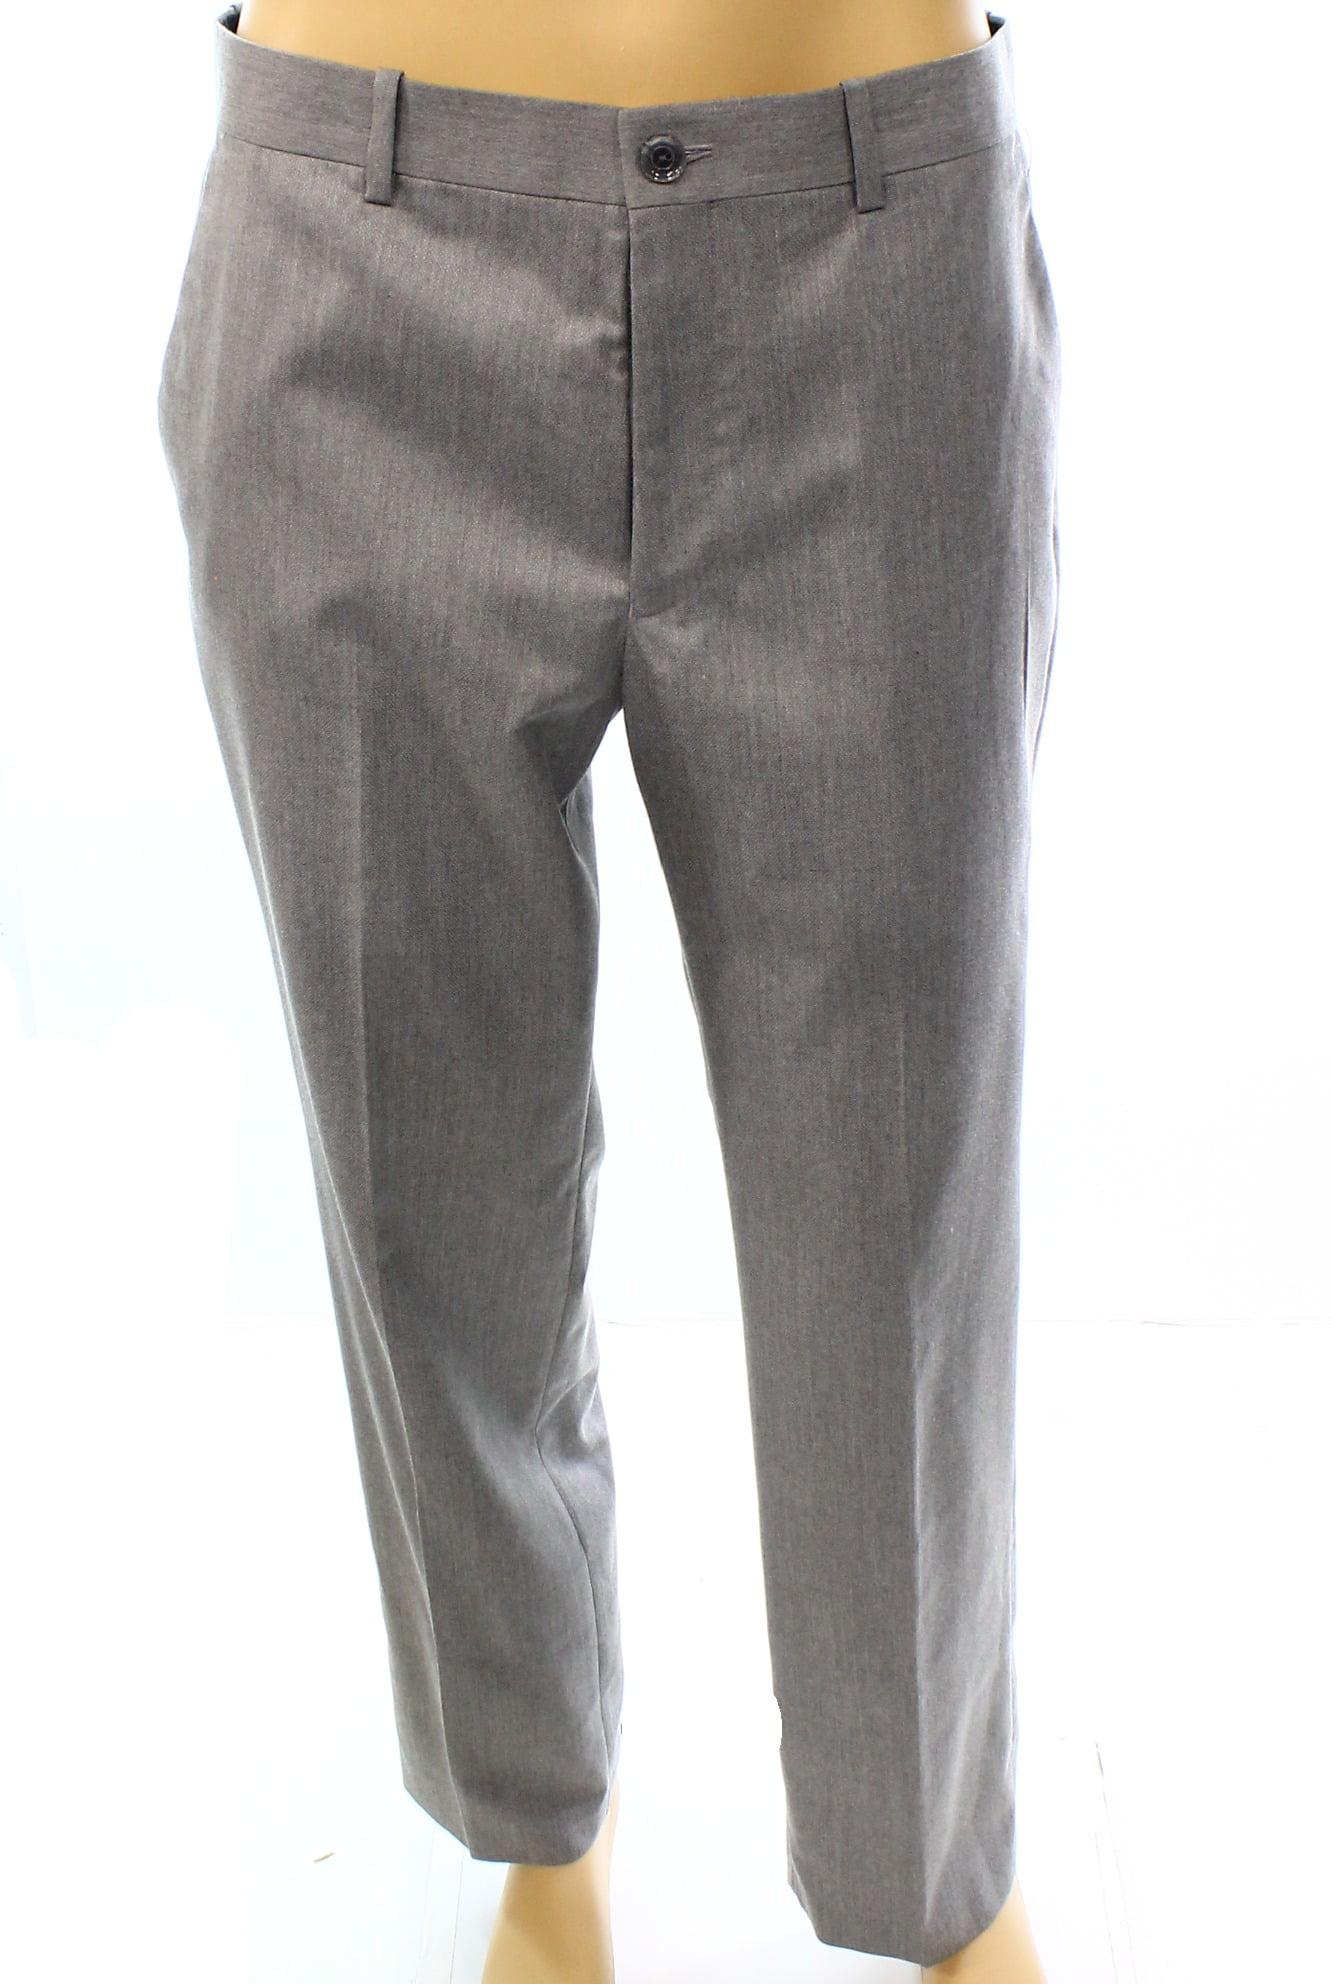 Alfani NEW Gray Light Mens Size 32X30 Regular Fit Flat Front Pants